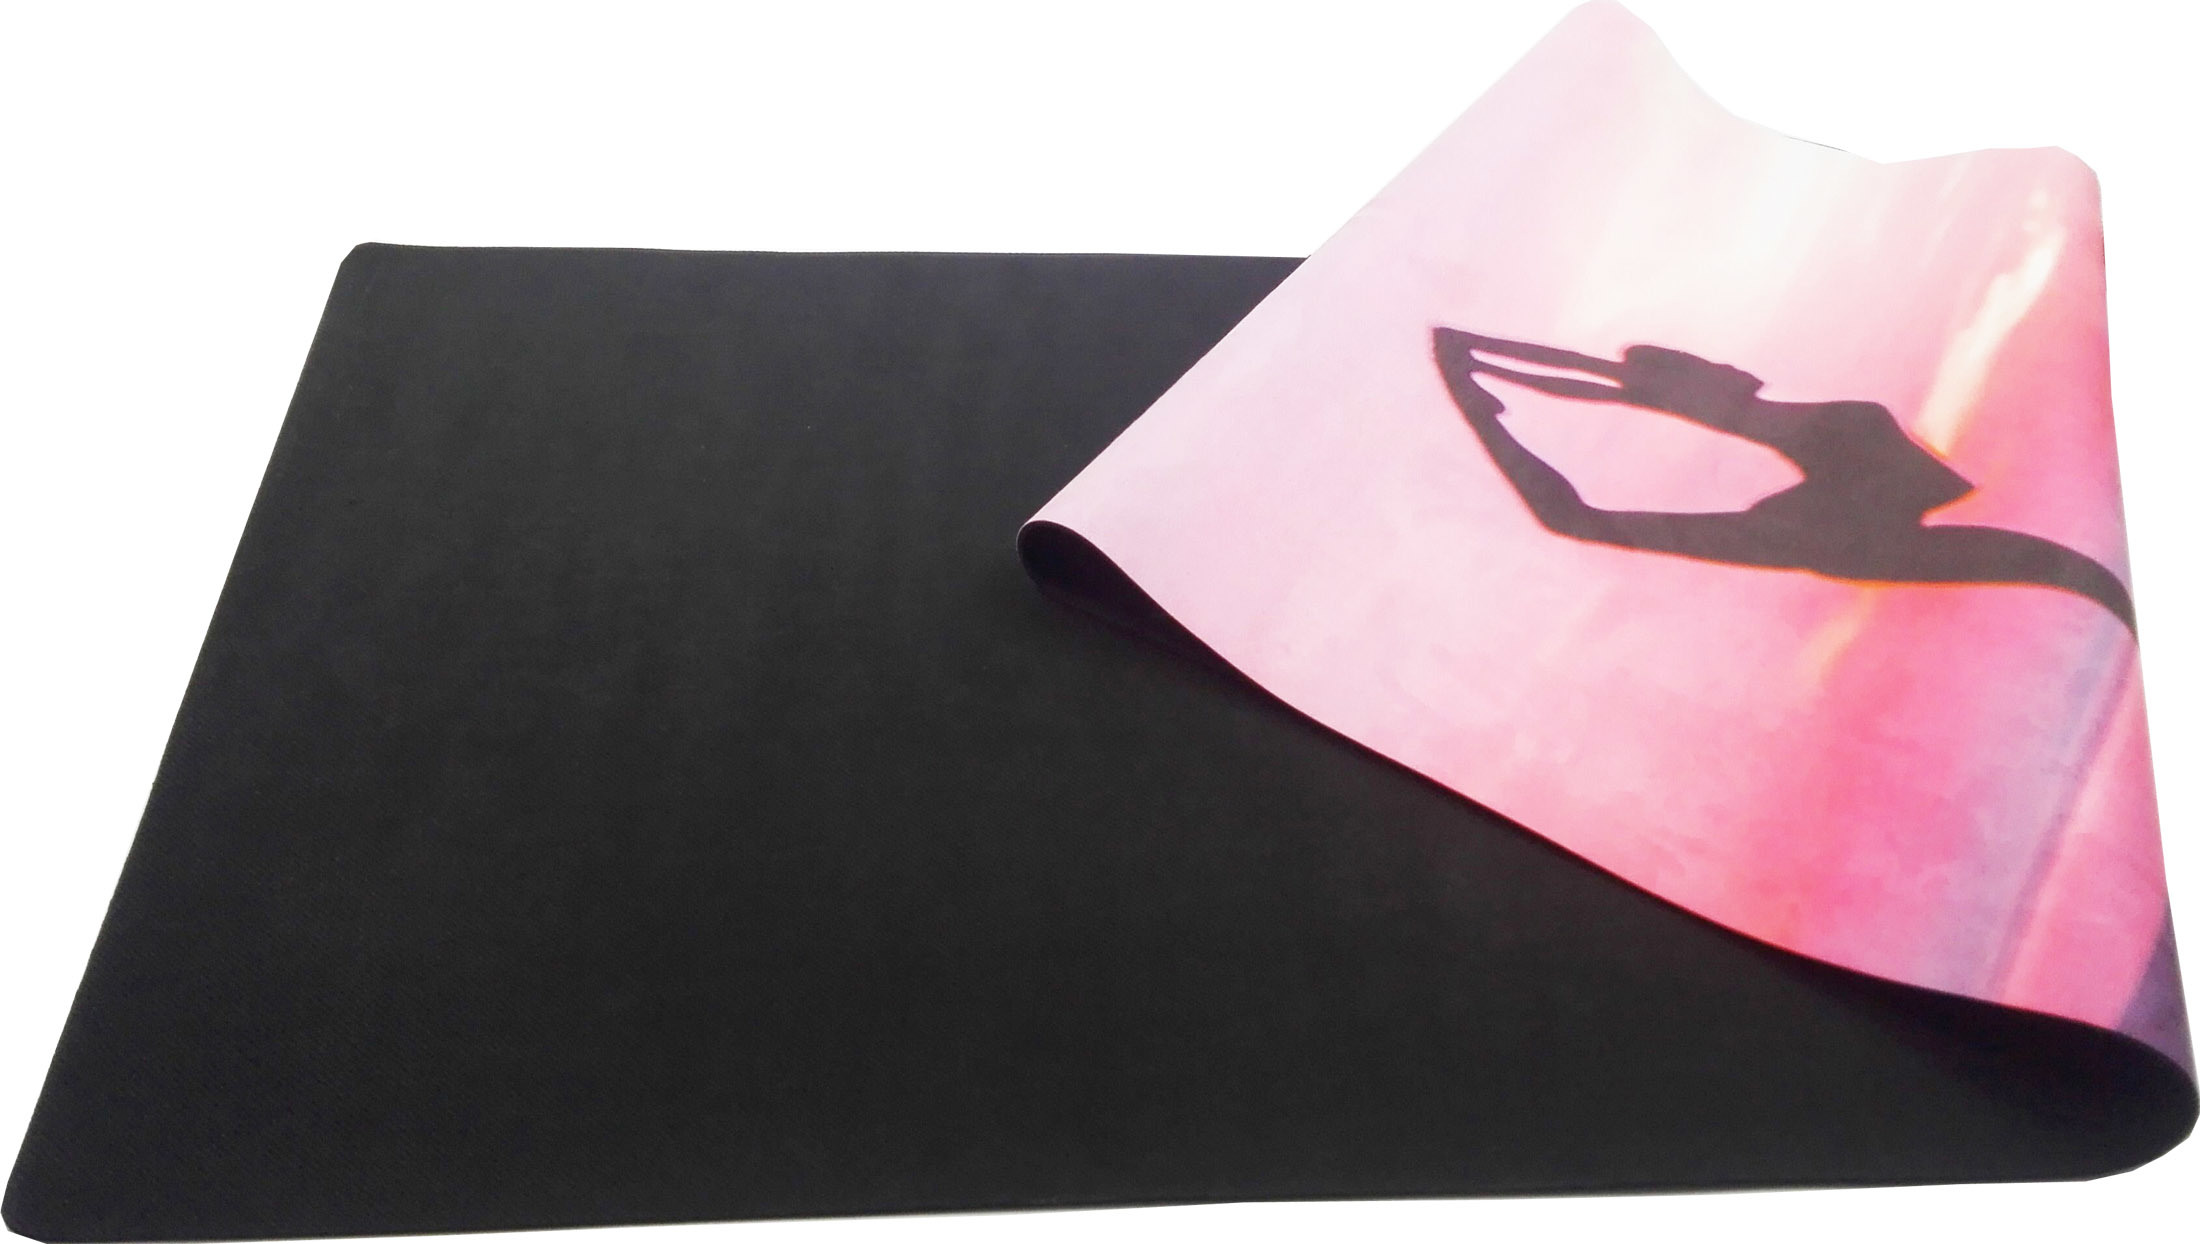 Customized Pattern Printed Yoga Mat Non-Slip Microfiber Mat